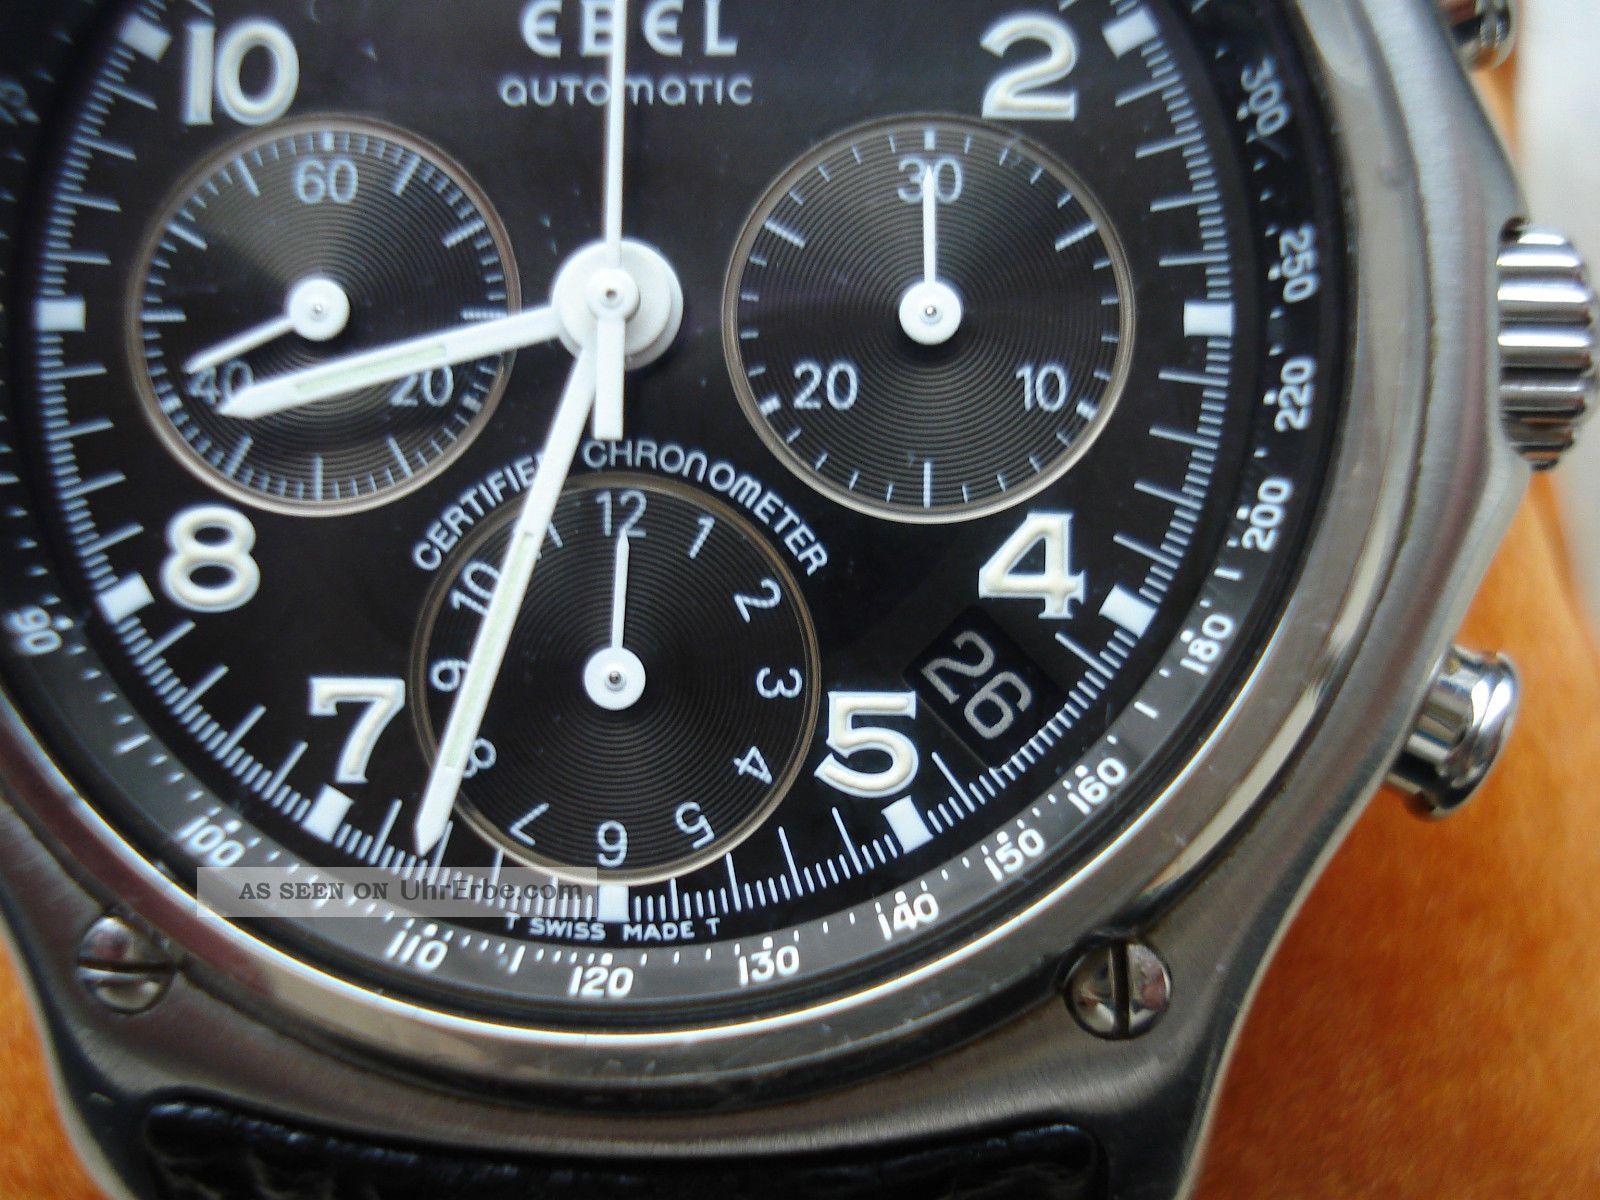 Ebel 1911 Le Modulor Edelstahl Chronograph Herren Glasboden Vp 4.  300,  - Armbanduhren Bild